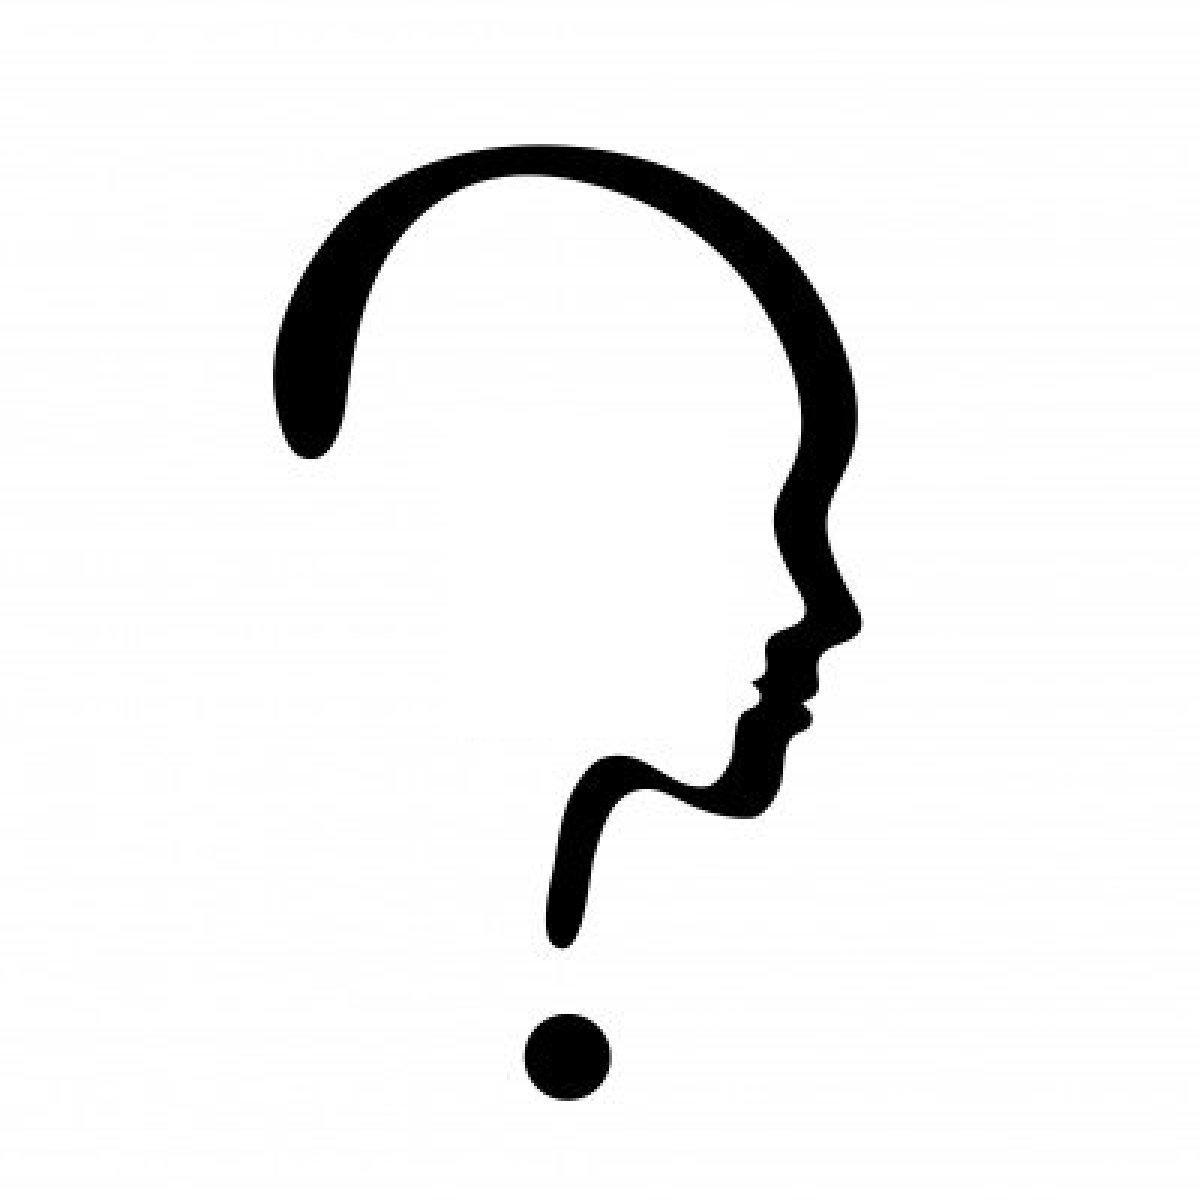 POTW  - Who am I